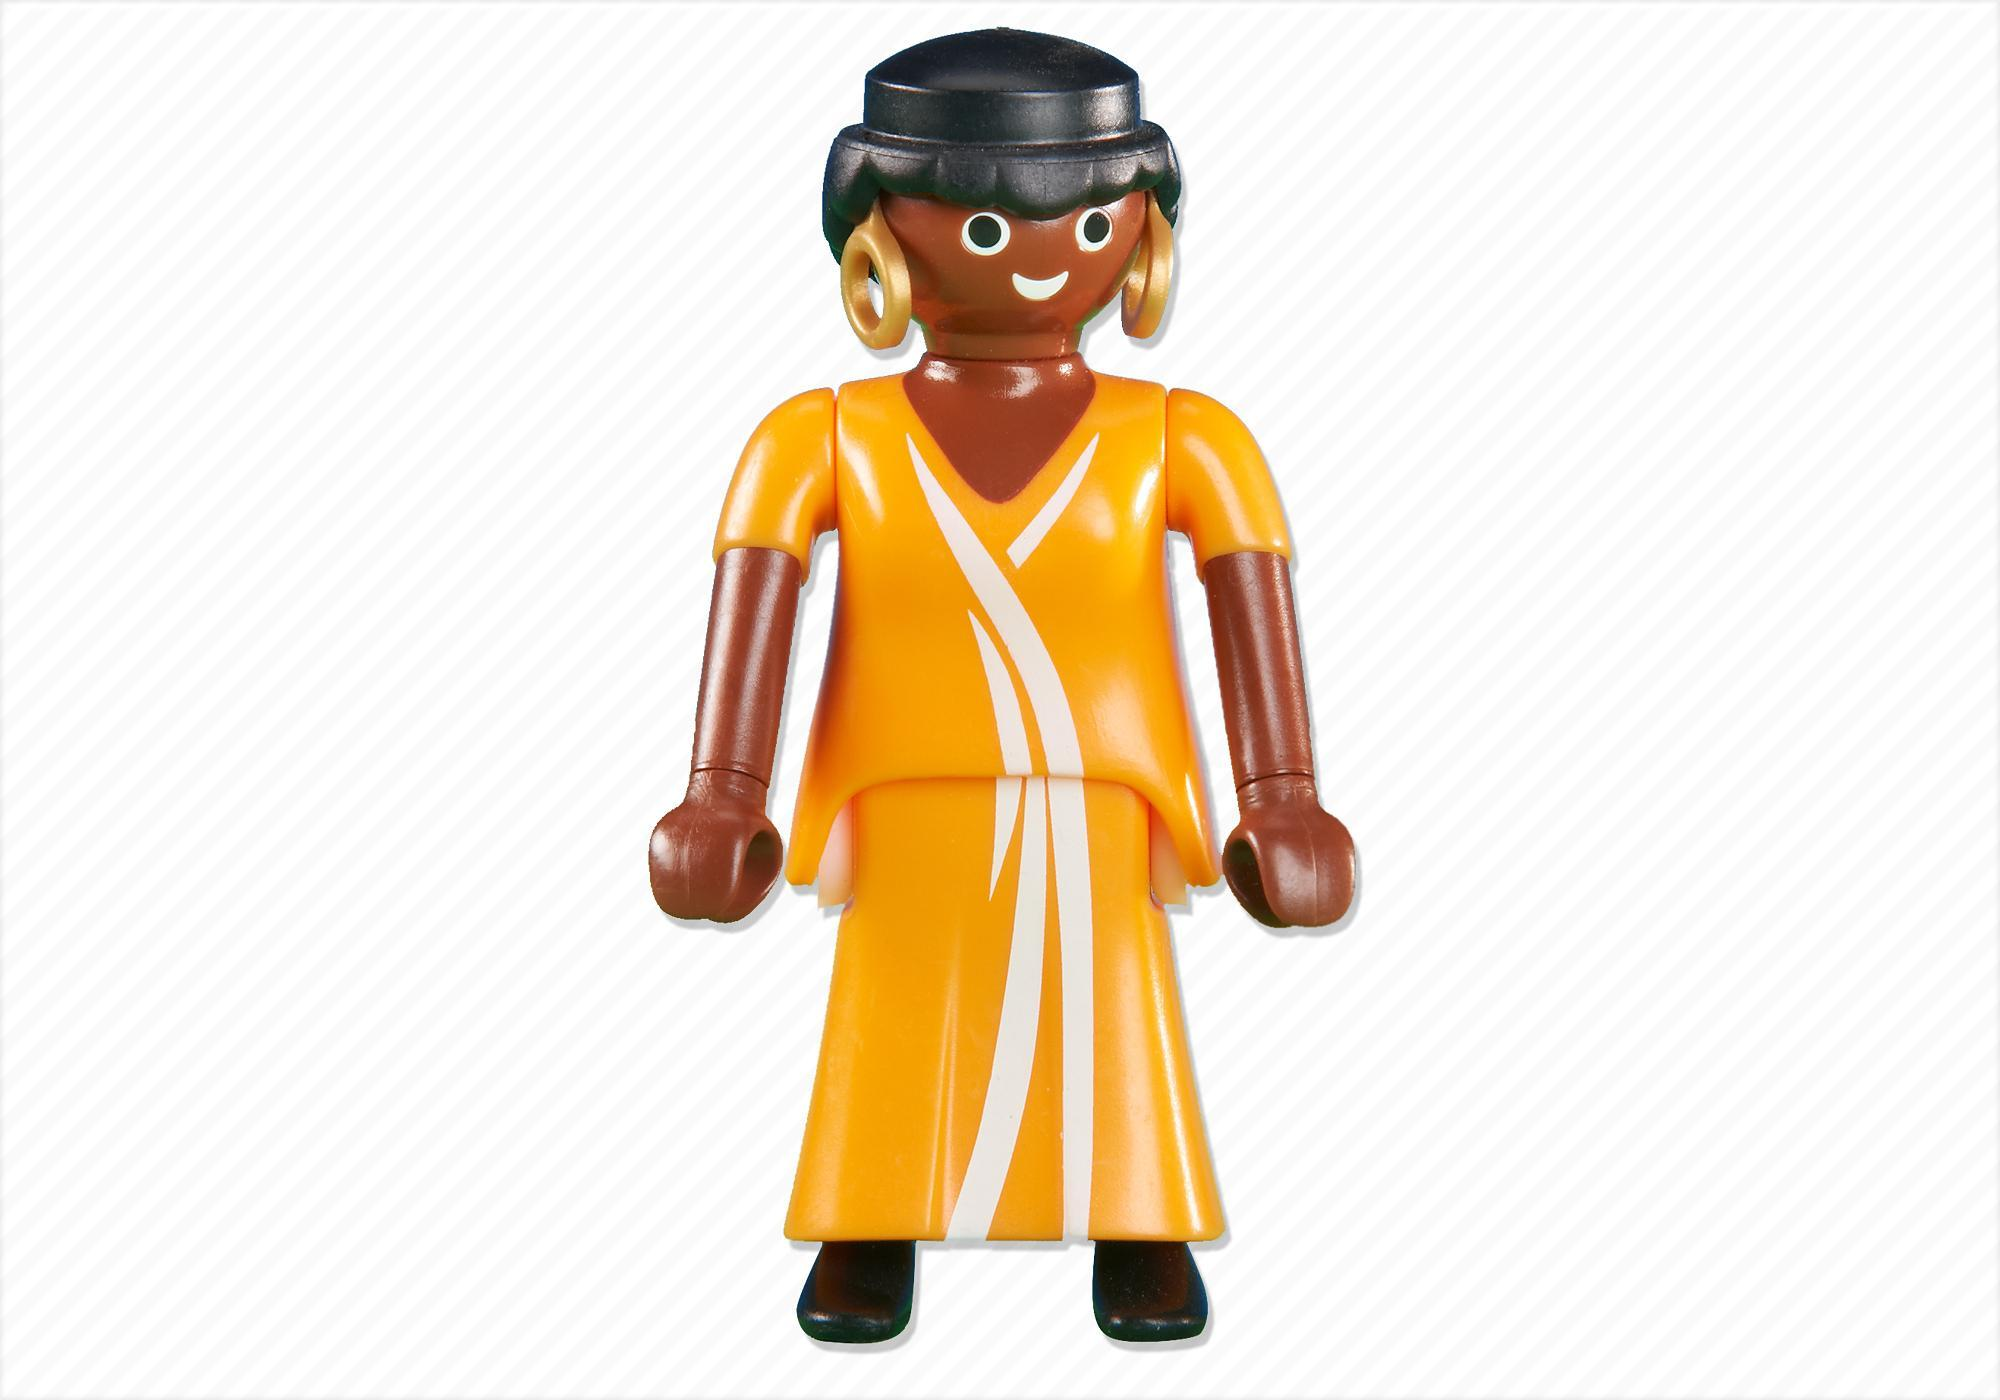 http://media.playmobil.com/i/playmobil/30142640_product_detail/Grundfigur 1900 Frau